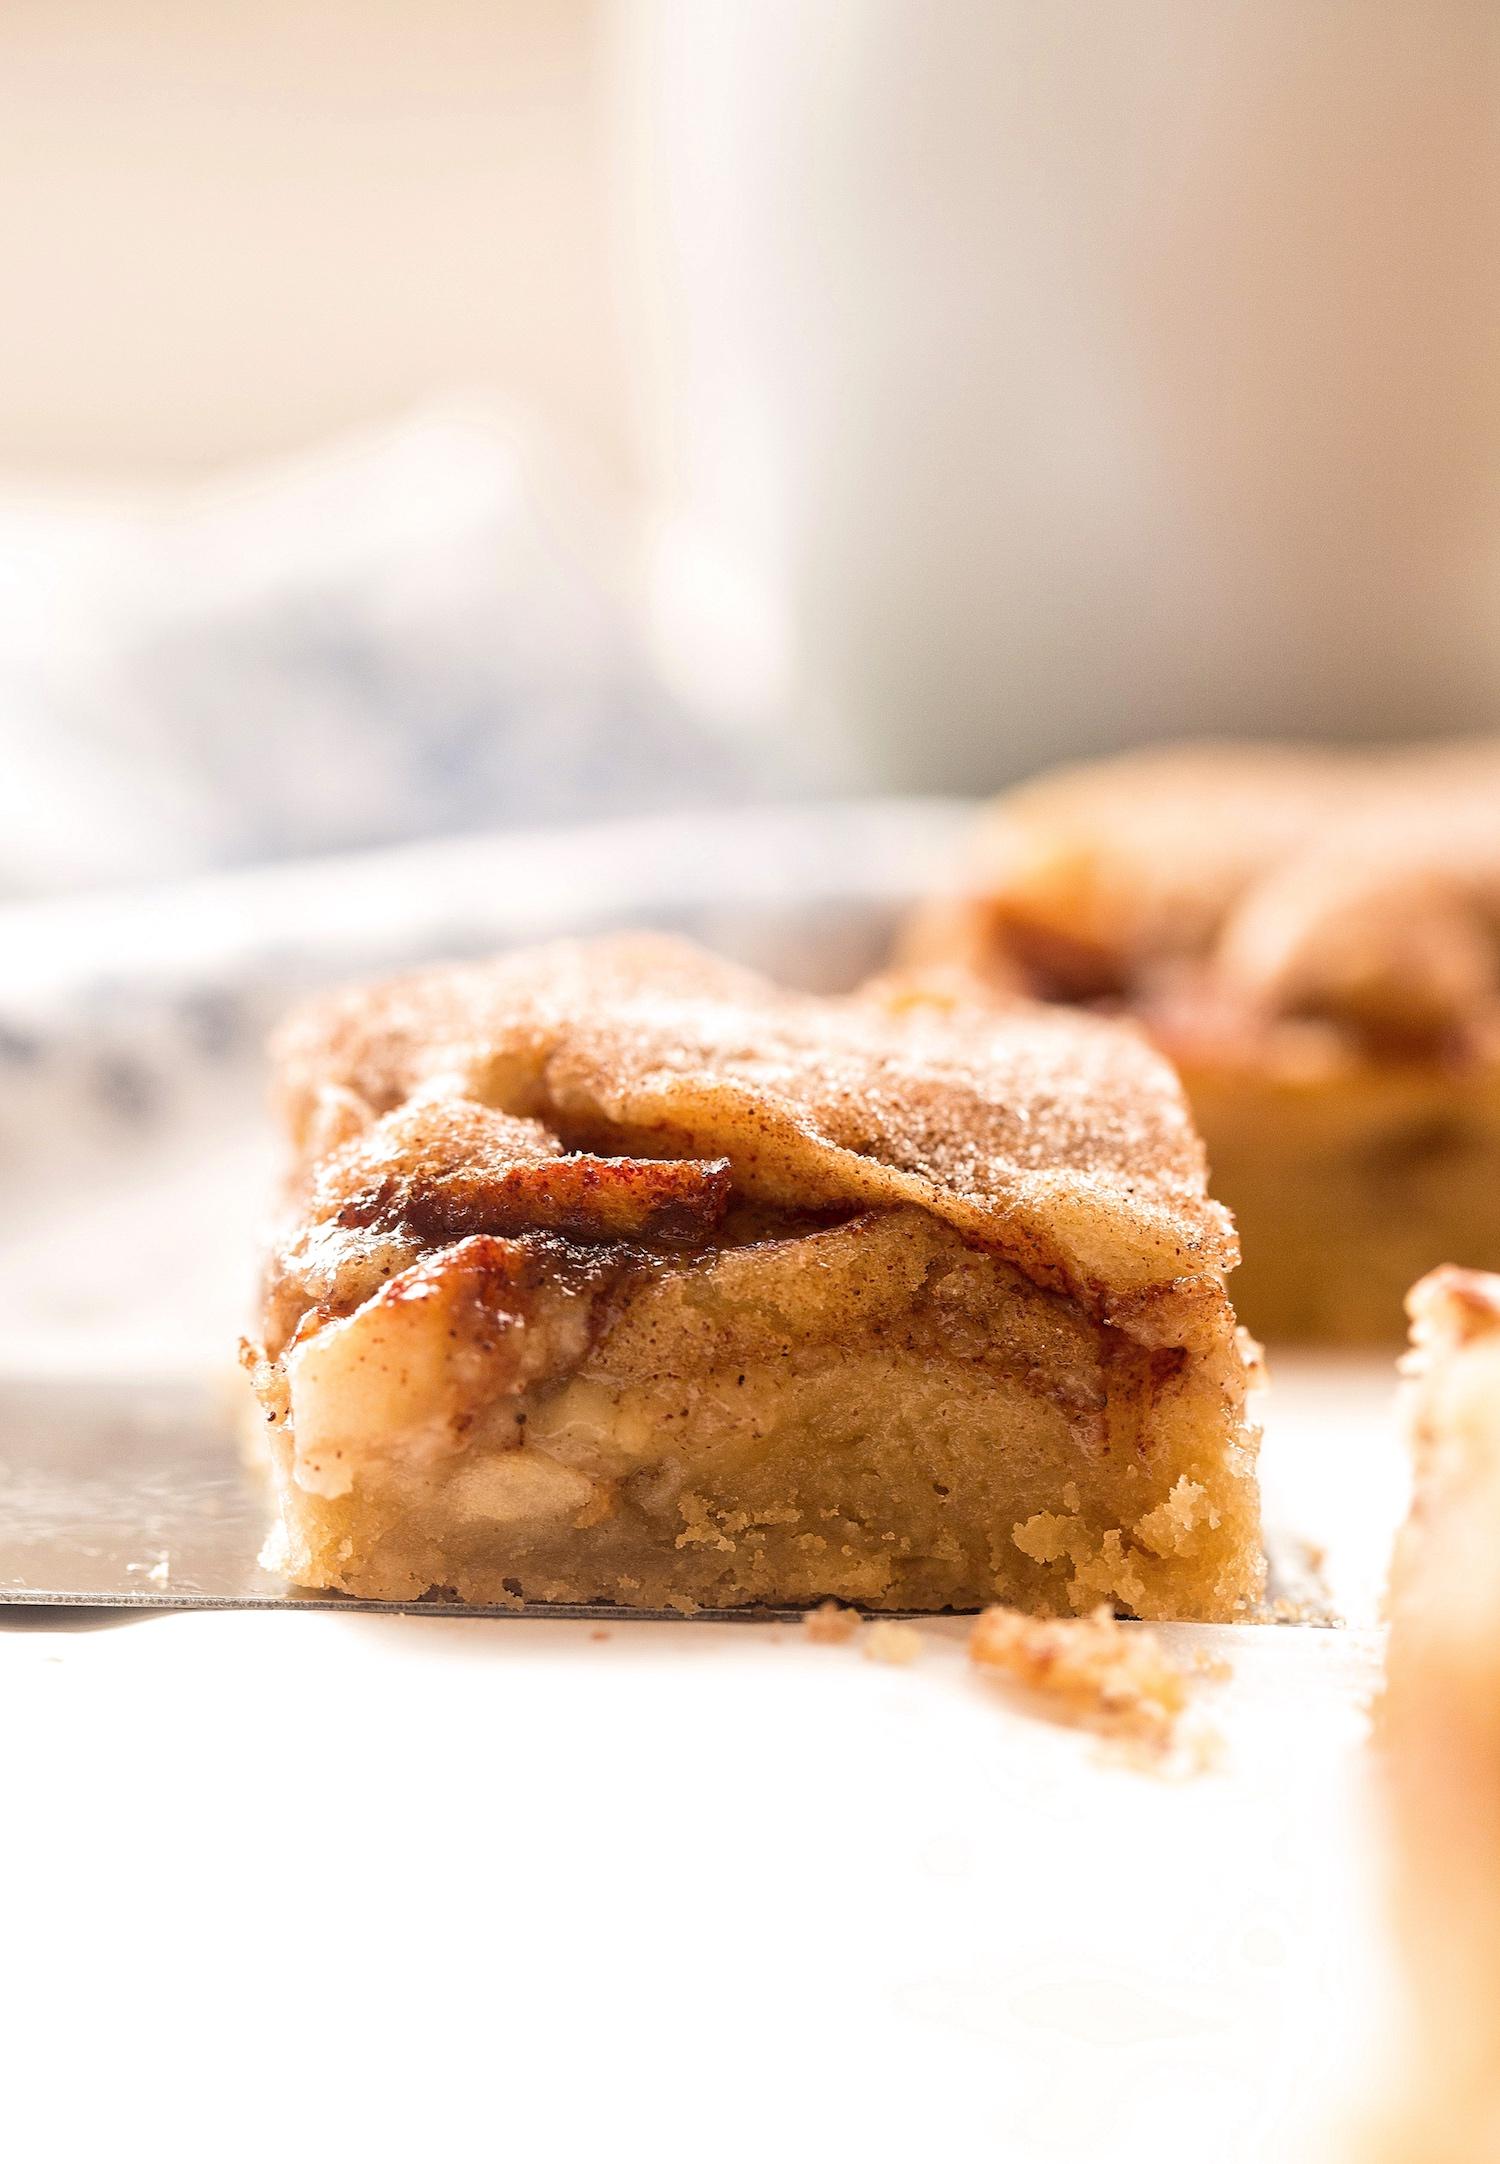 Gooey Snickerdoodle Cookie Apple Bars: tender, juicy, cinnamon apple slices encased in gooey, rich snickerdoodle cookie dough. Easy and dairy-free! | TrufflesandTrends.com